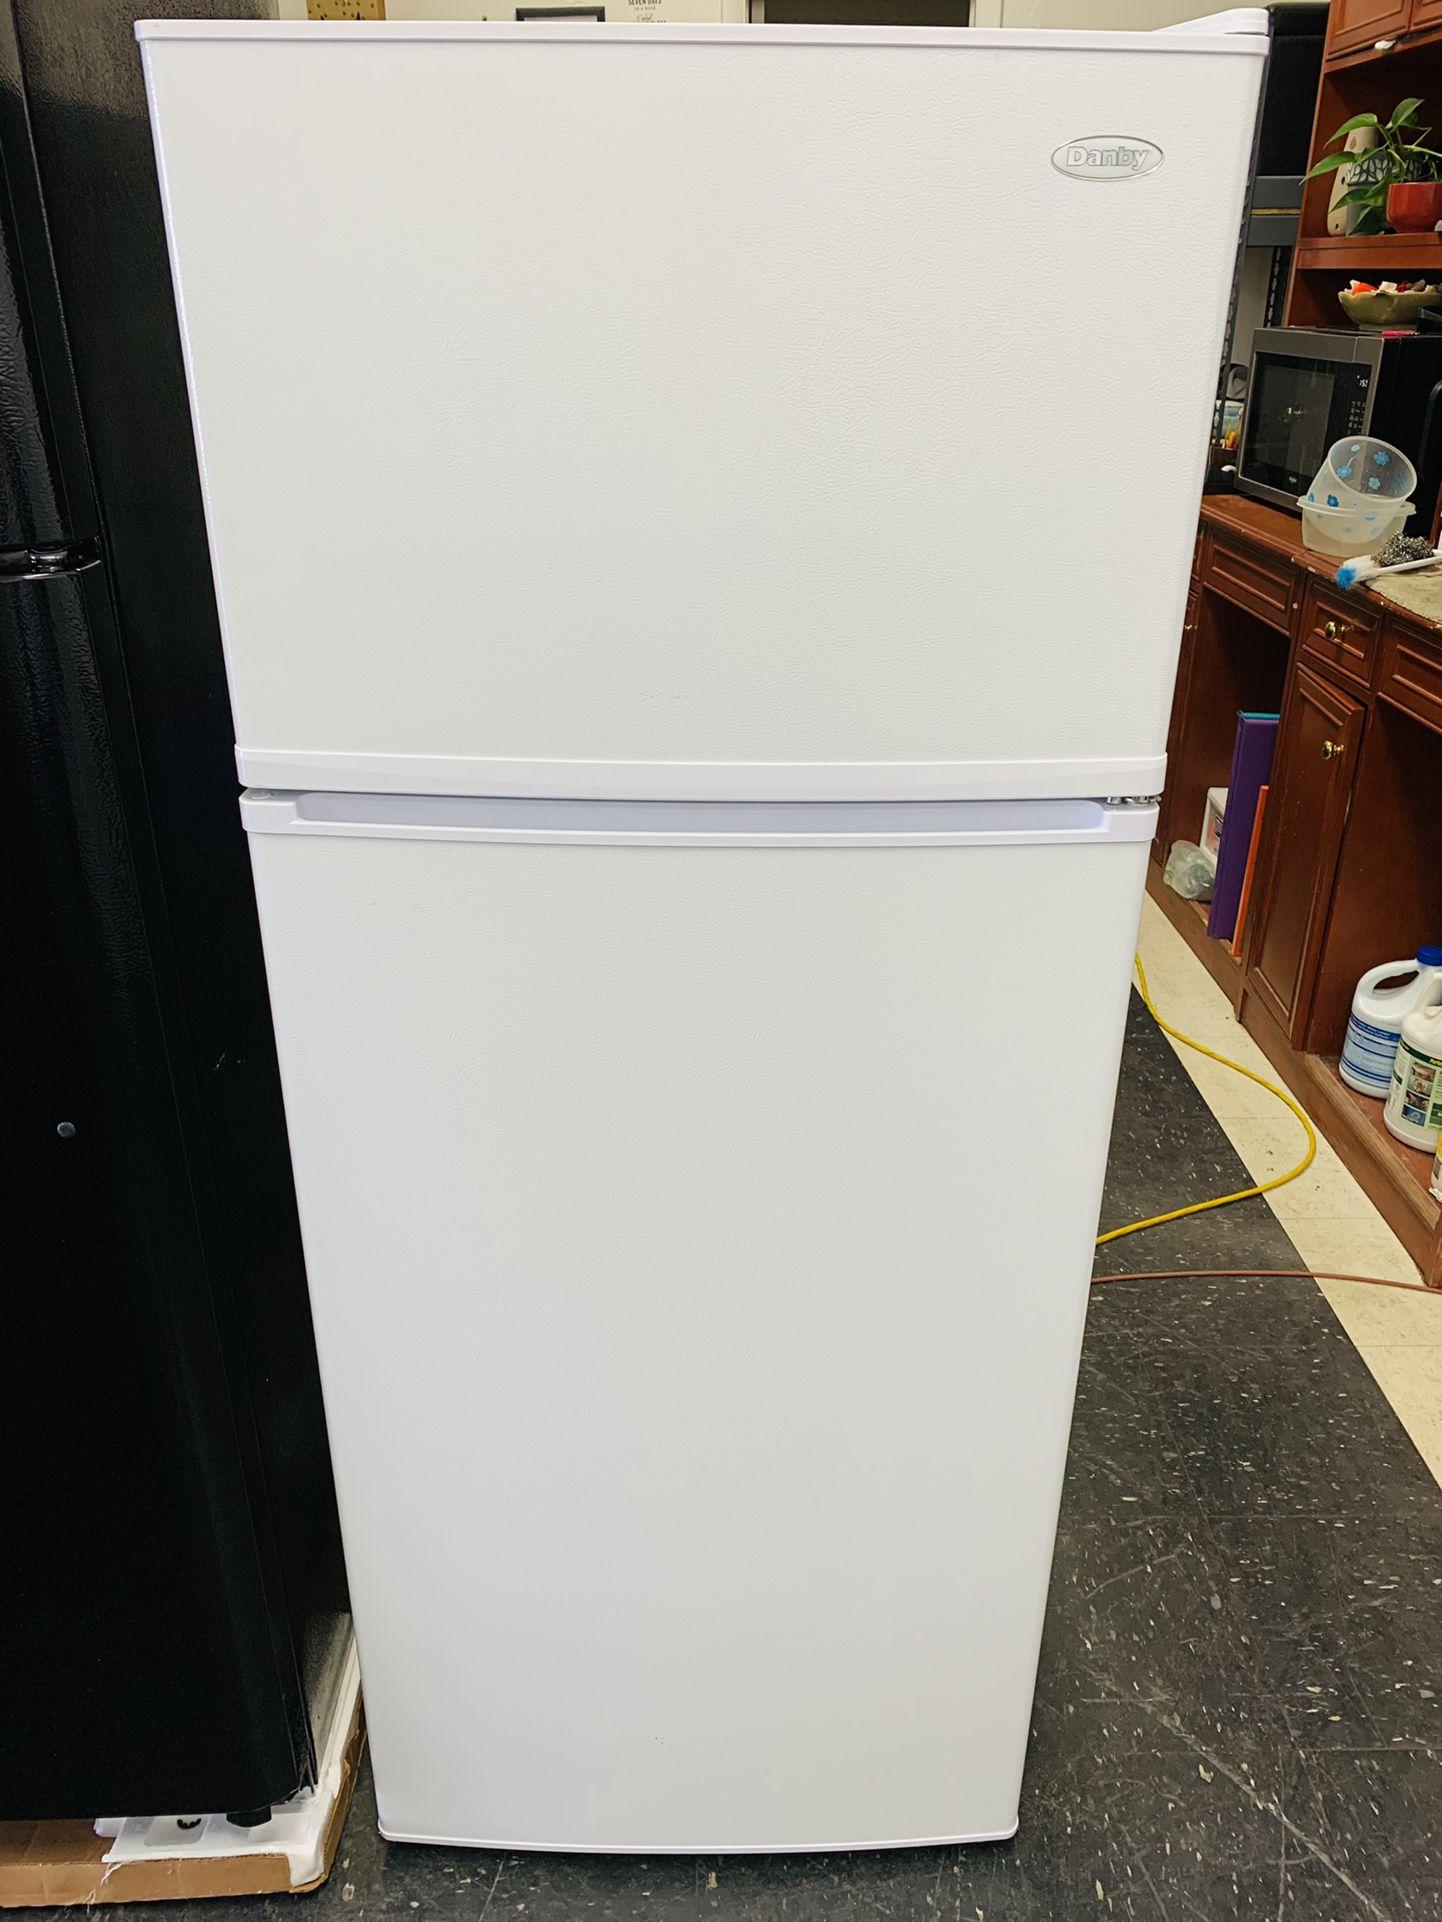 Danby Top/Bottom Refrigerator